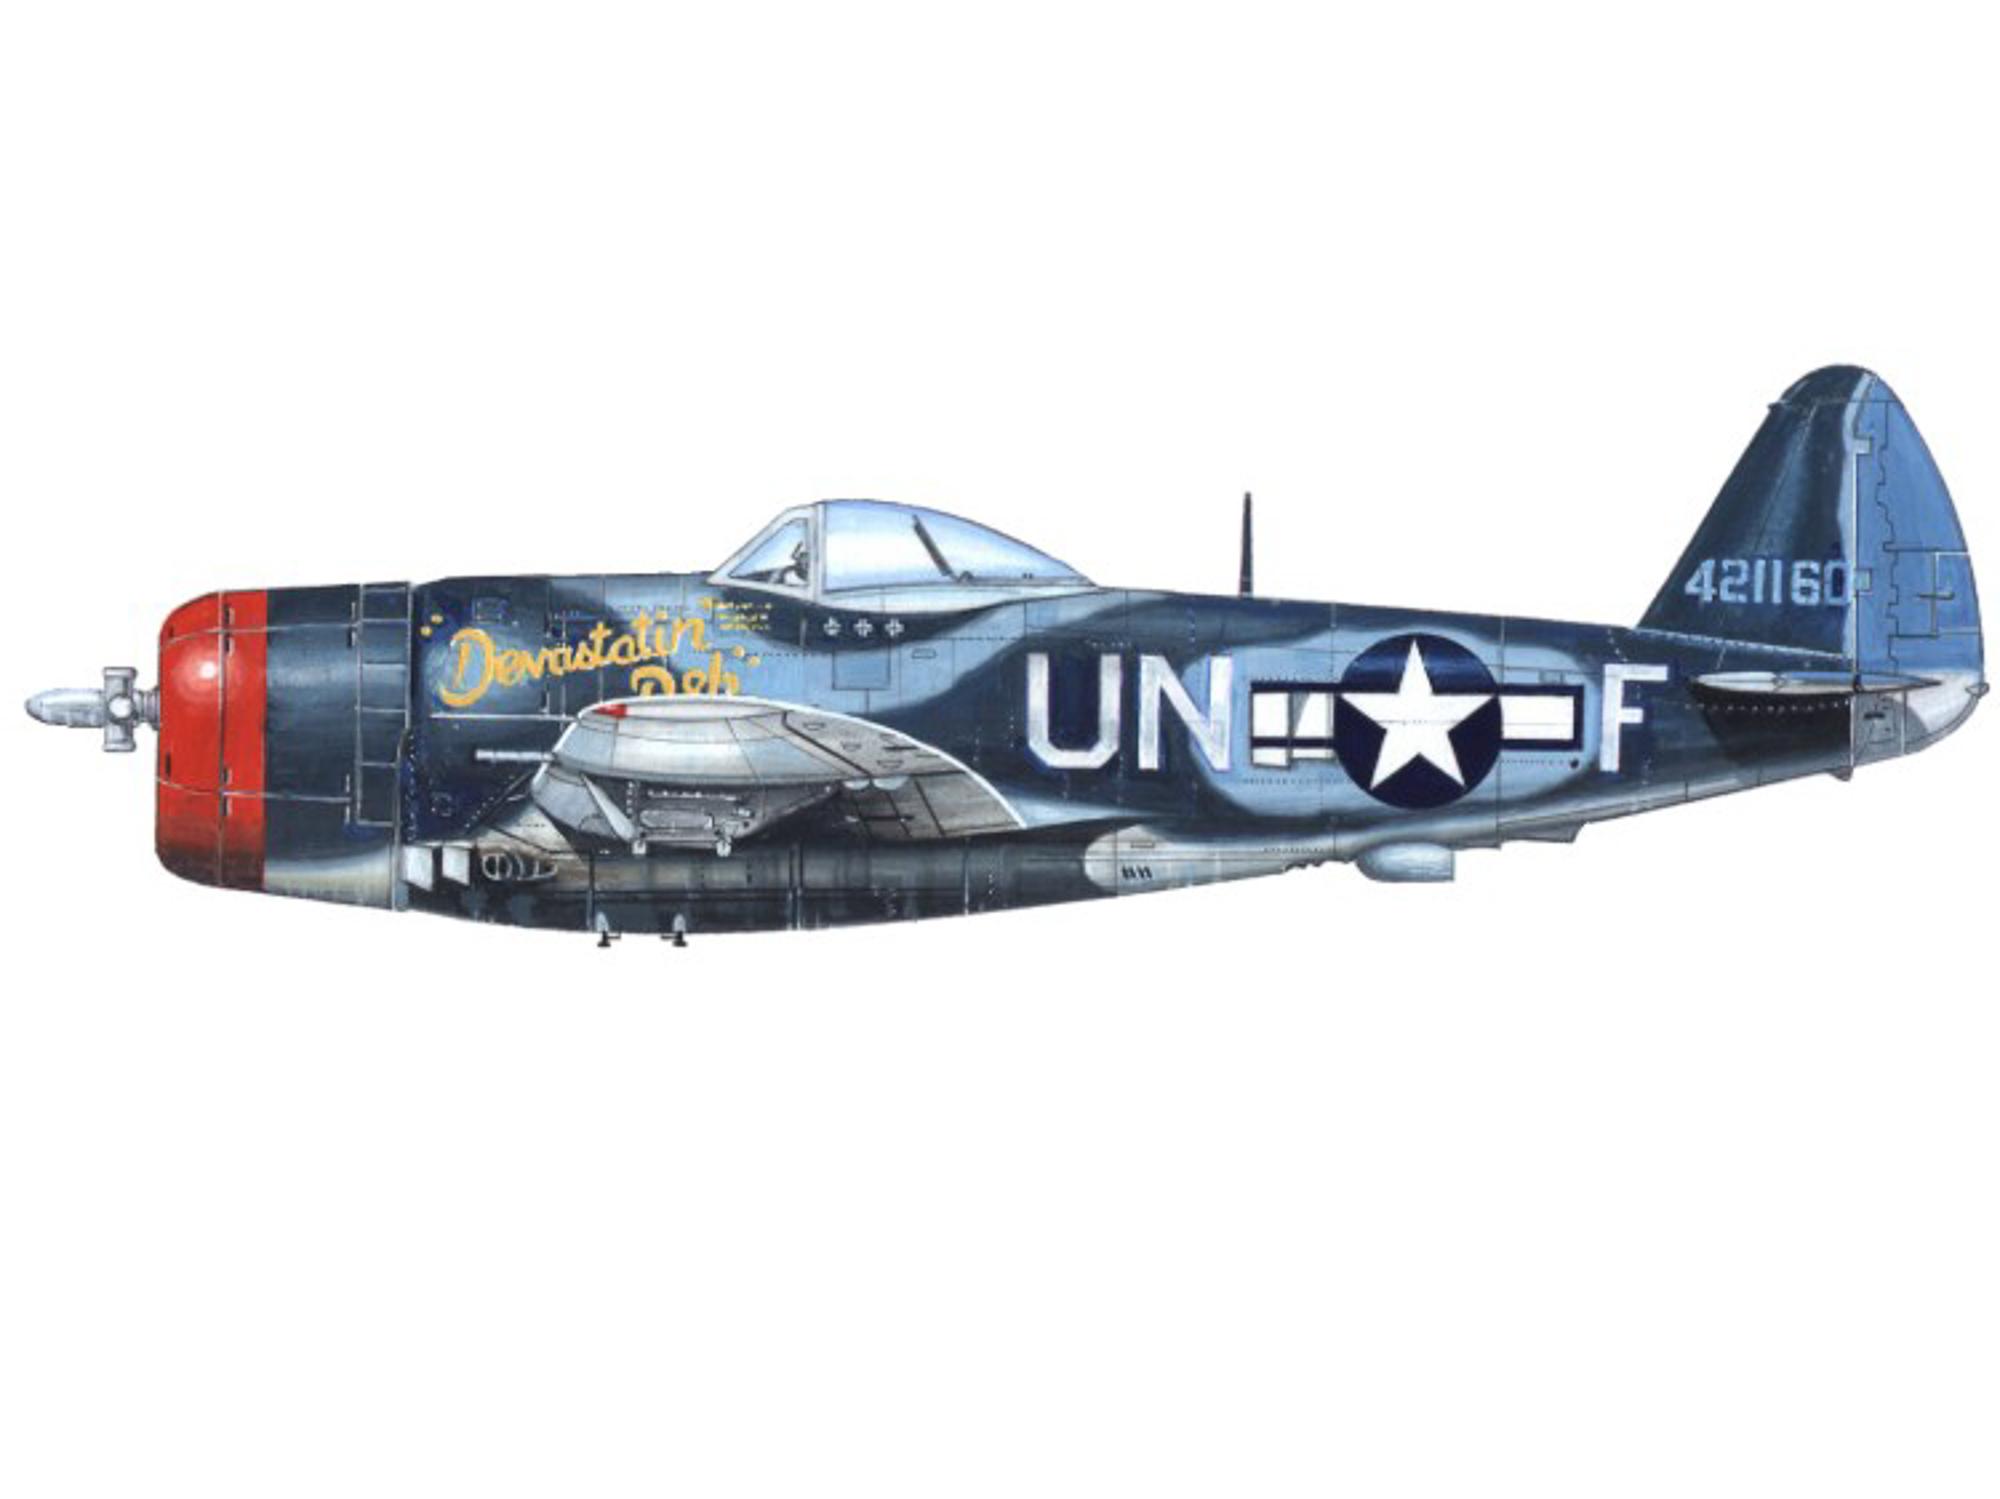 P-47M – Devastatin' Deb - 44-21160